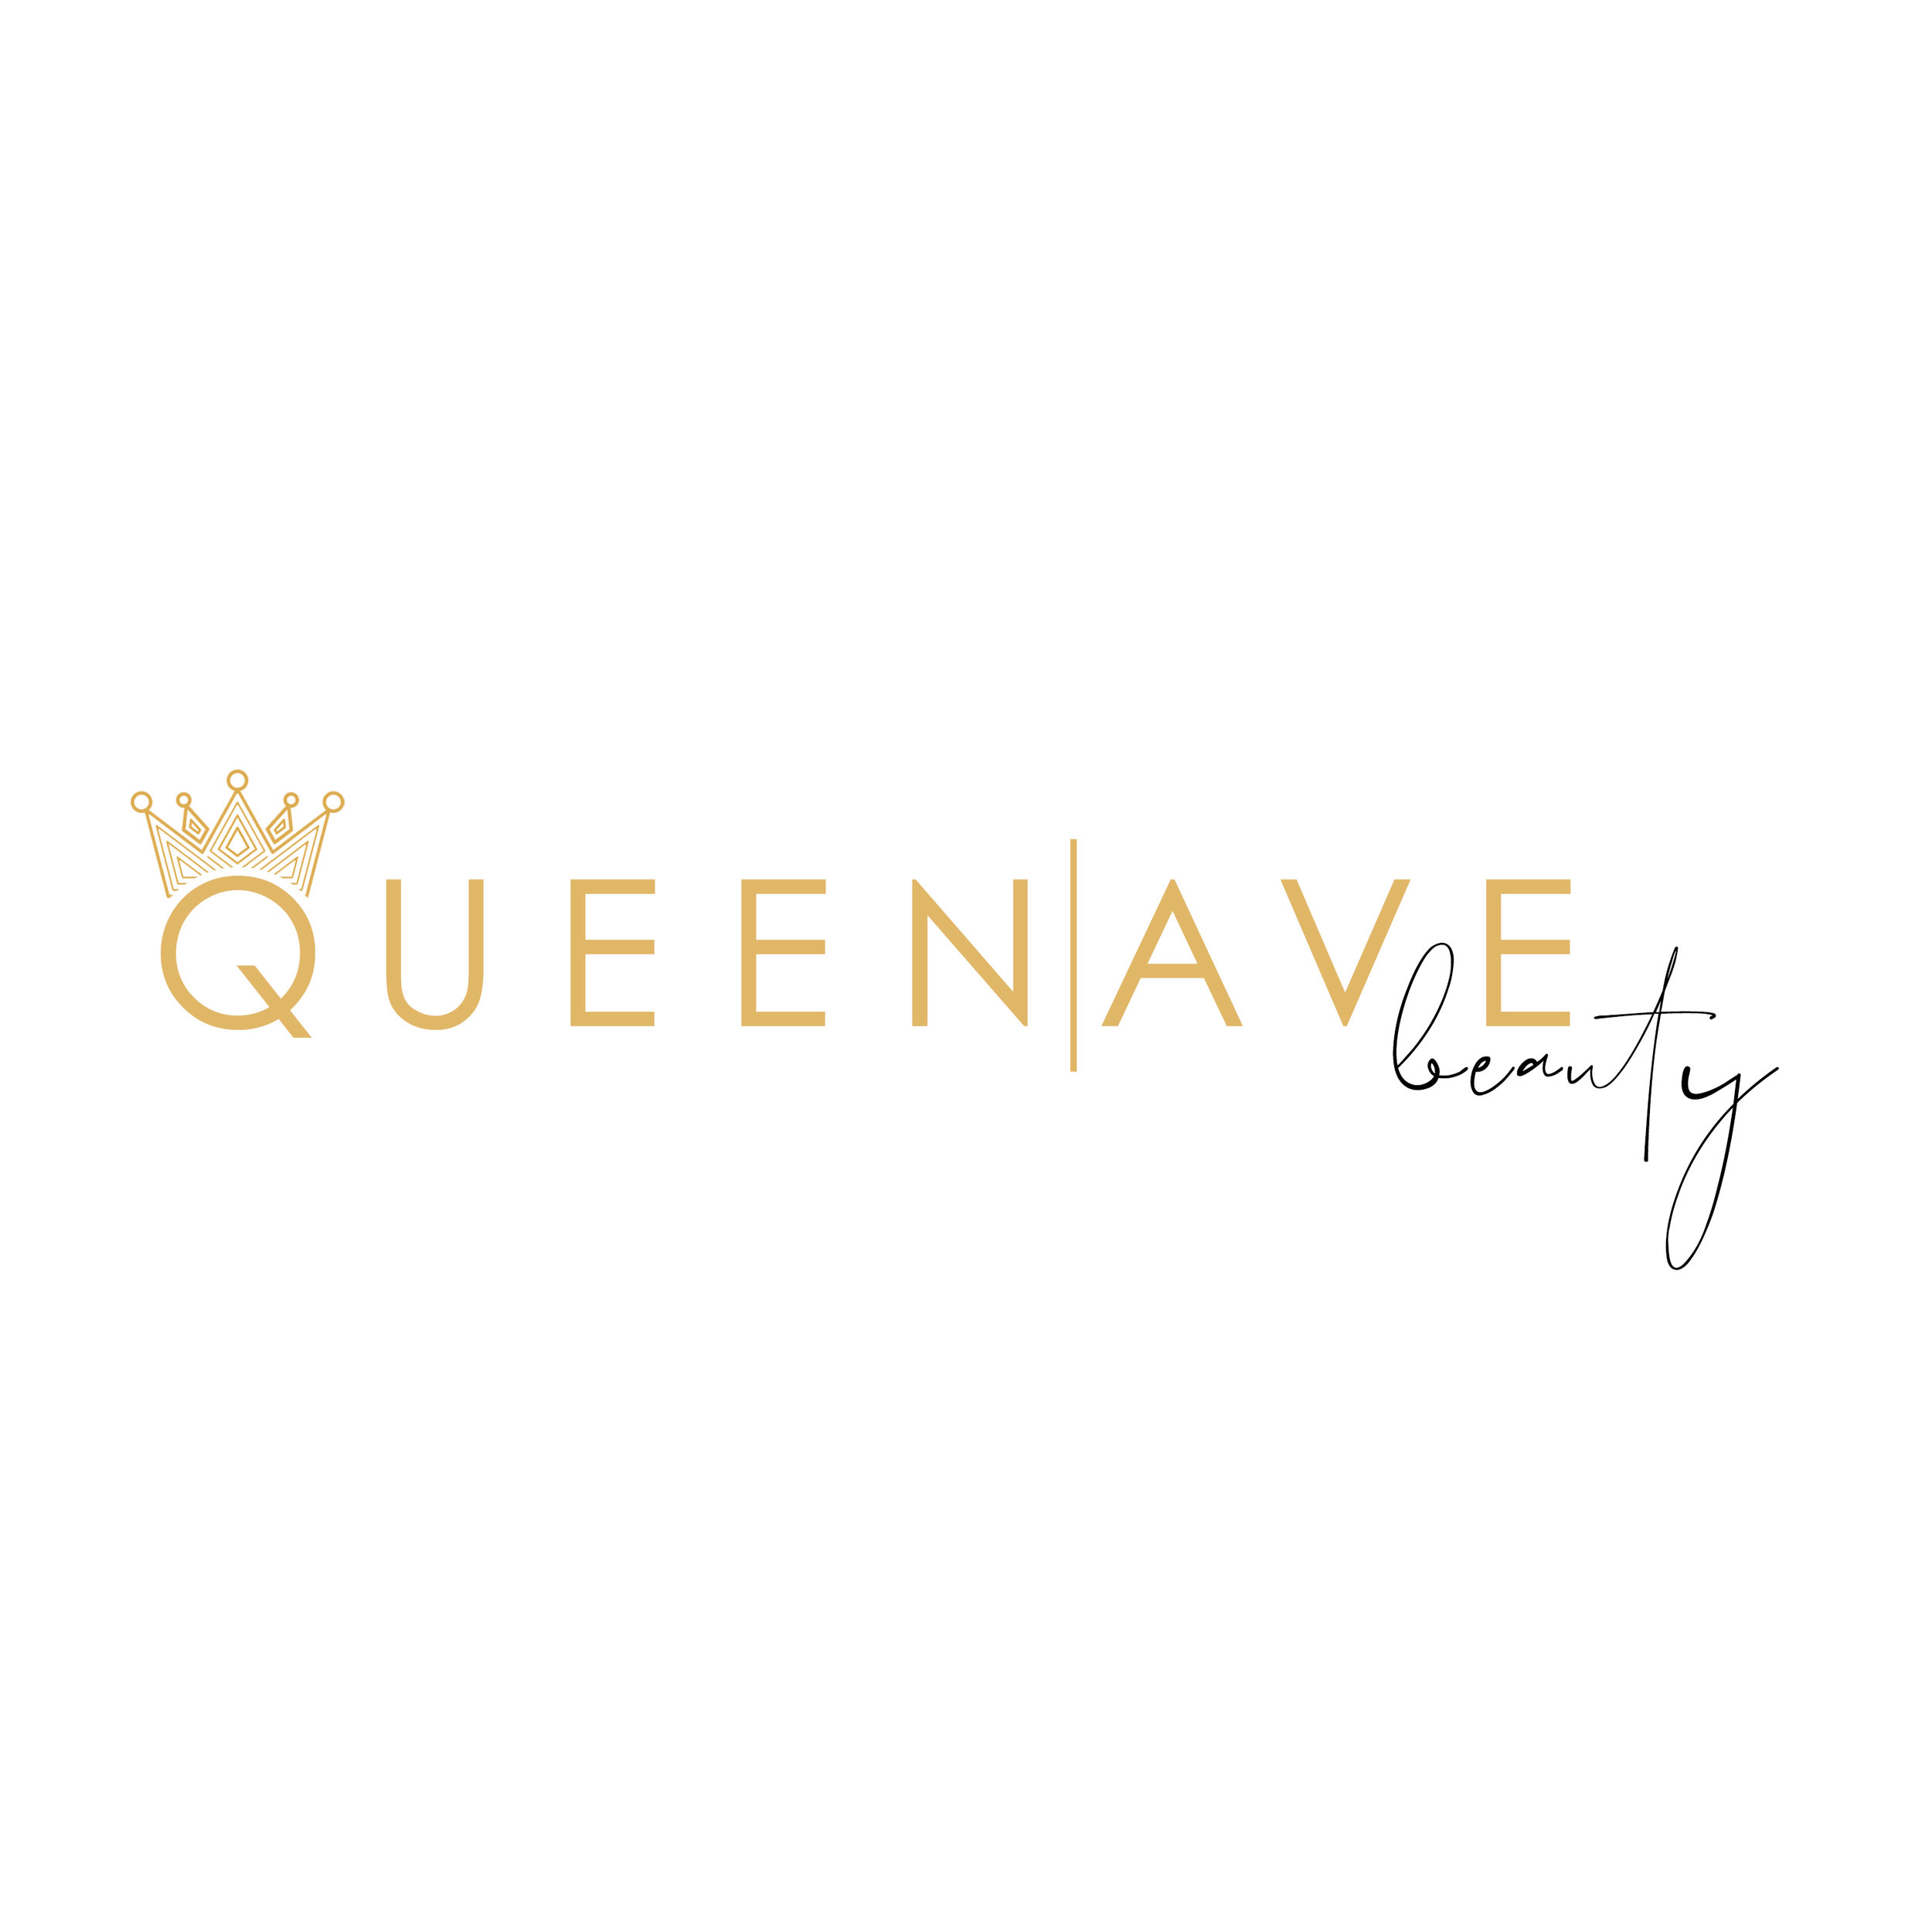 Queen Ave Logo.jpg